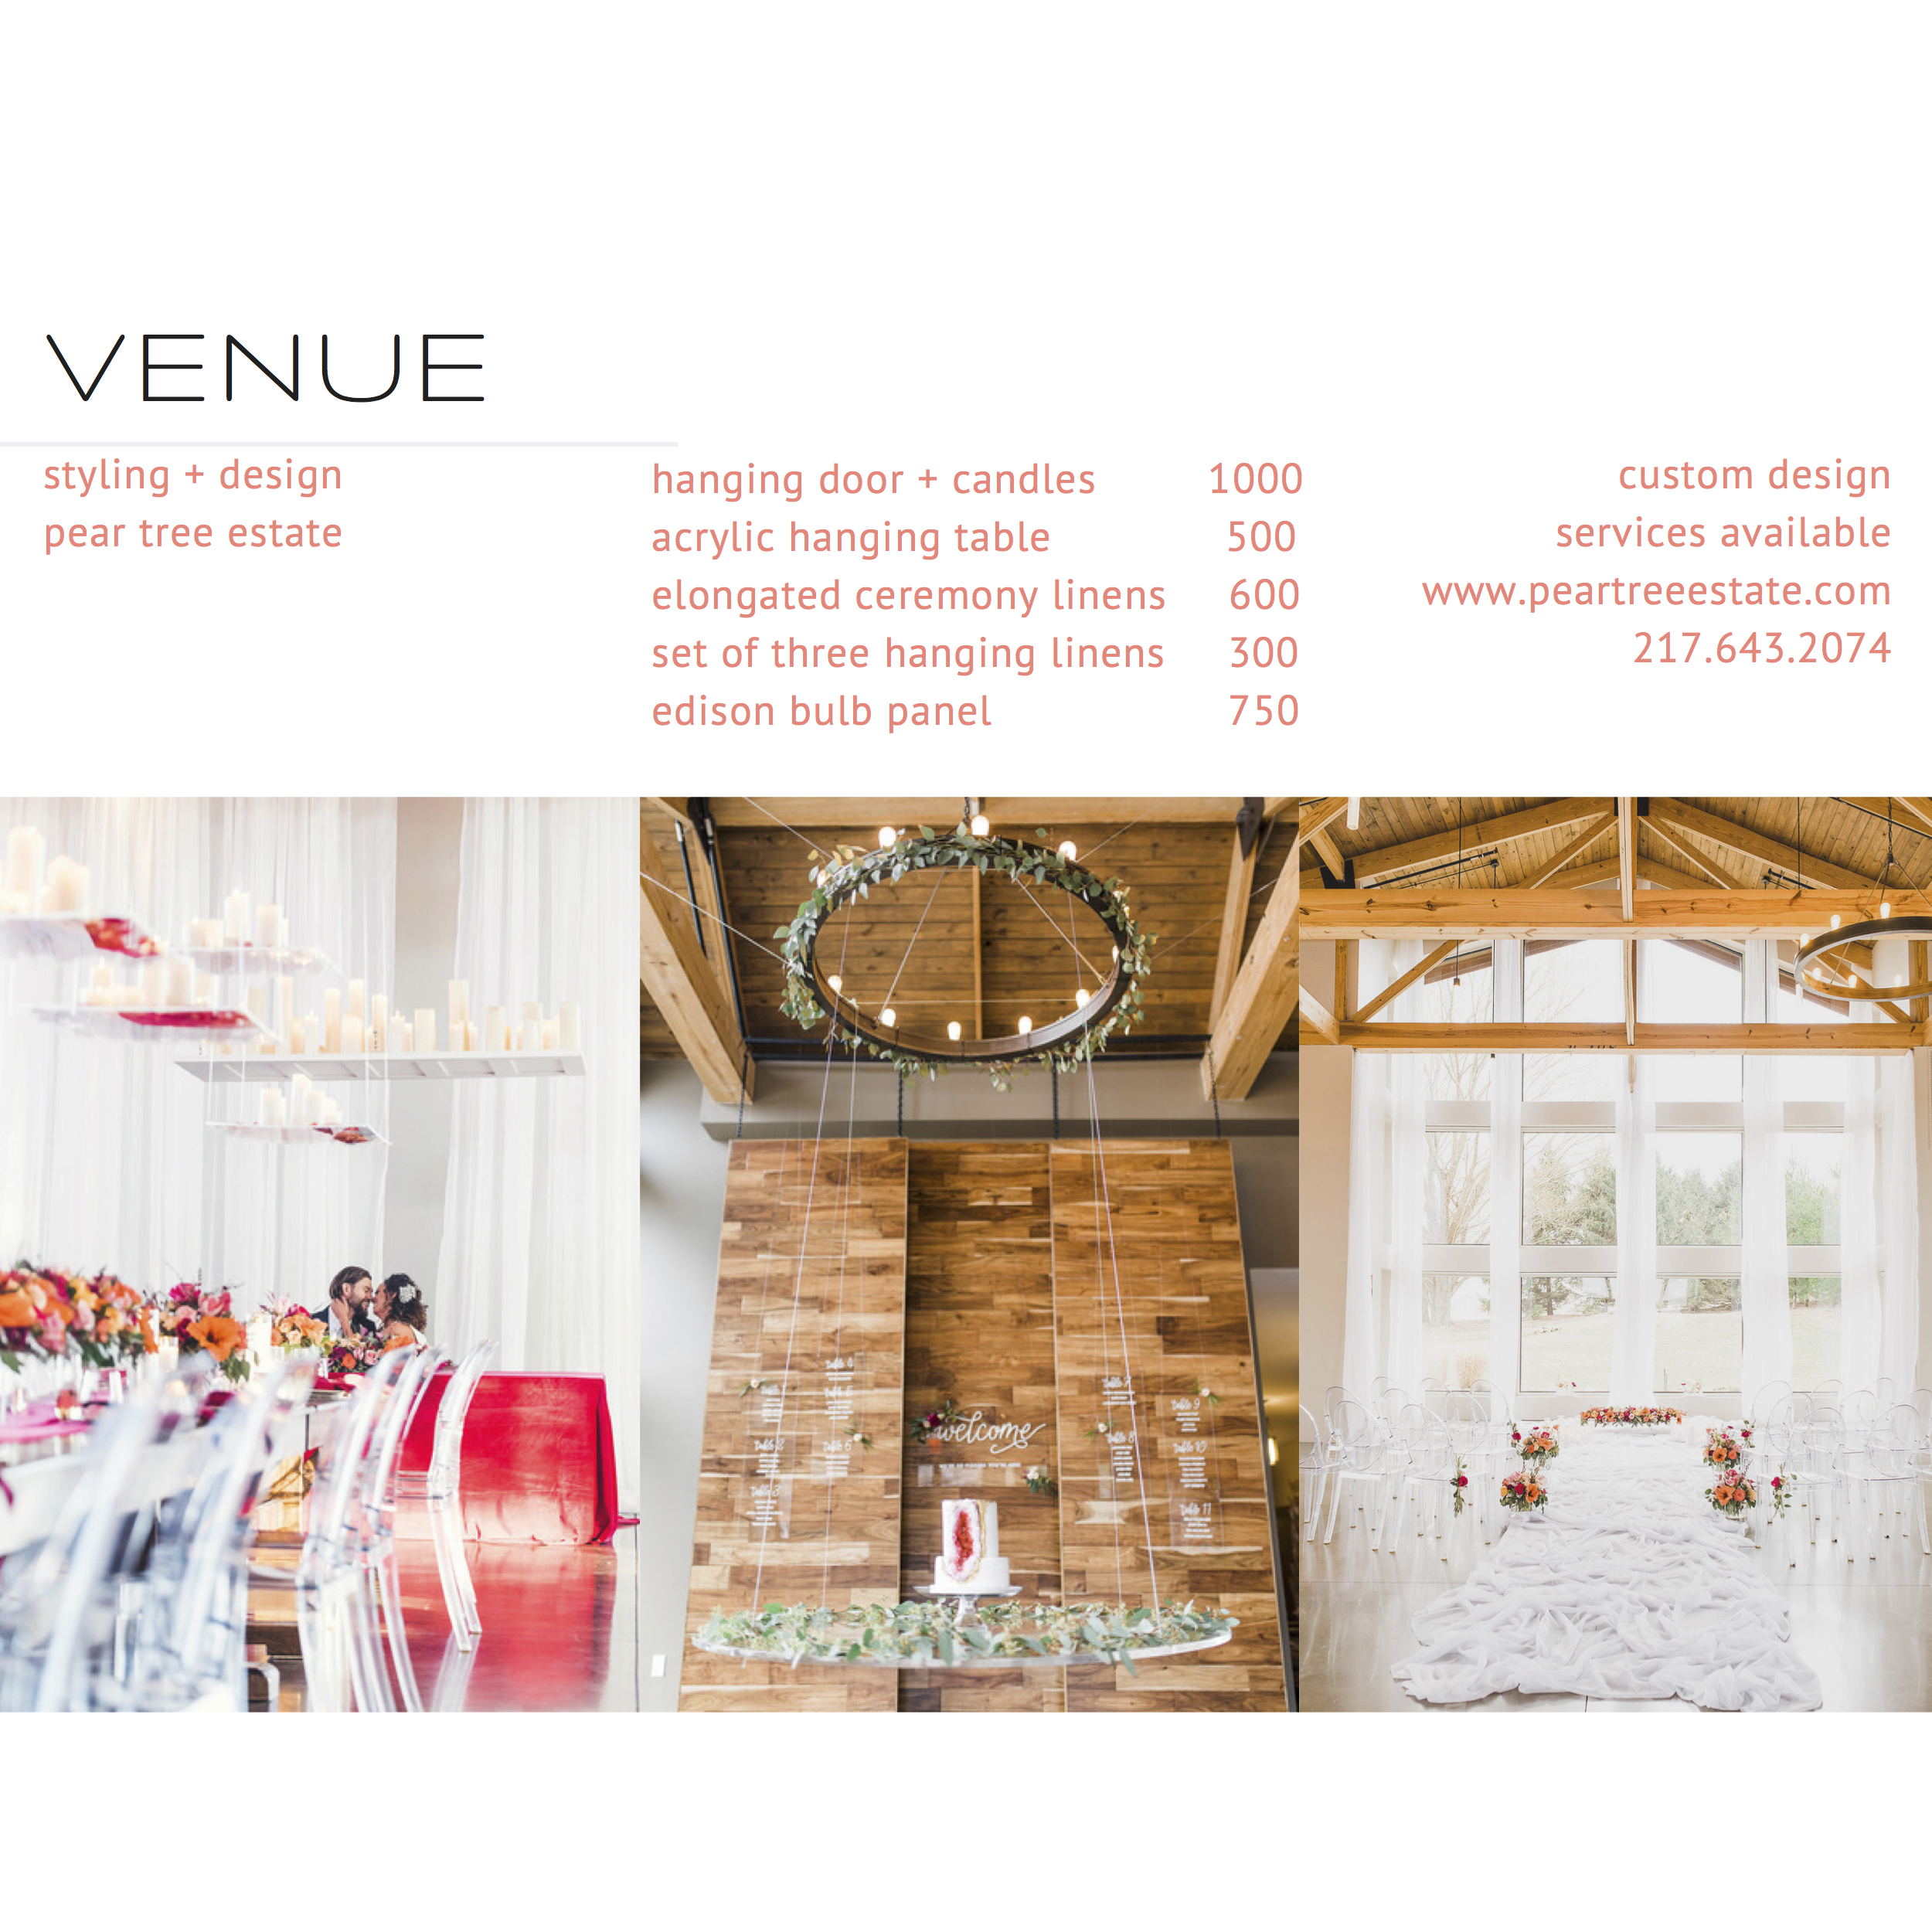 March 2017 Pg. 4 Design Inspiration Pear Tree Estate Styled Shoo.jpg